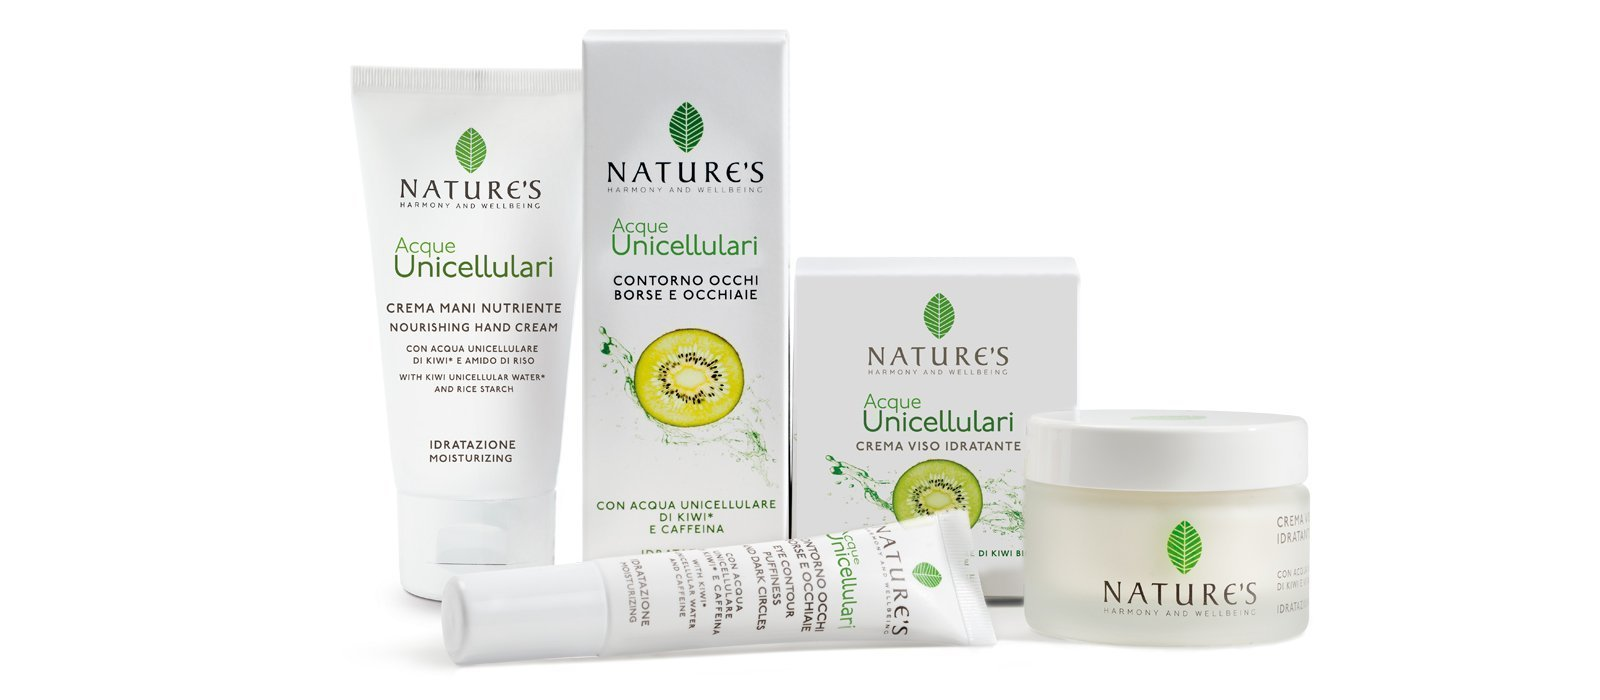 Idratazione Acque Unicellulari Nature's